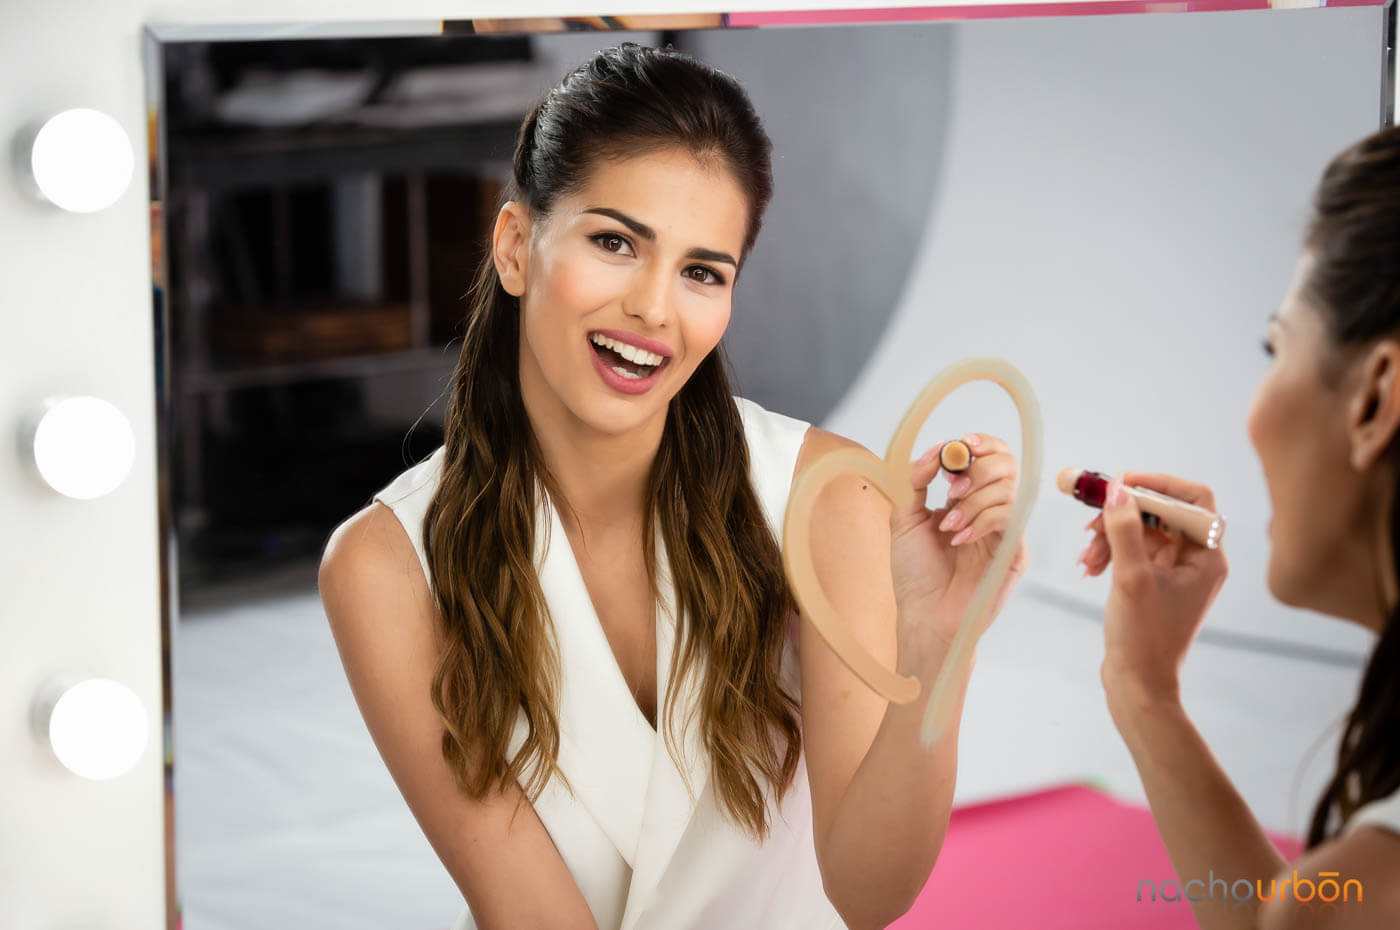 fotografo nacho_urbon especialista moda belleza